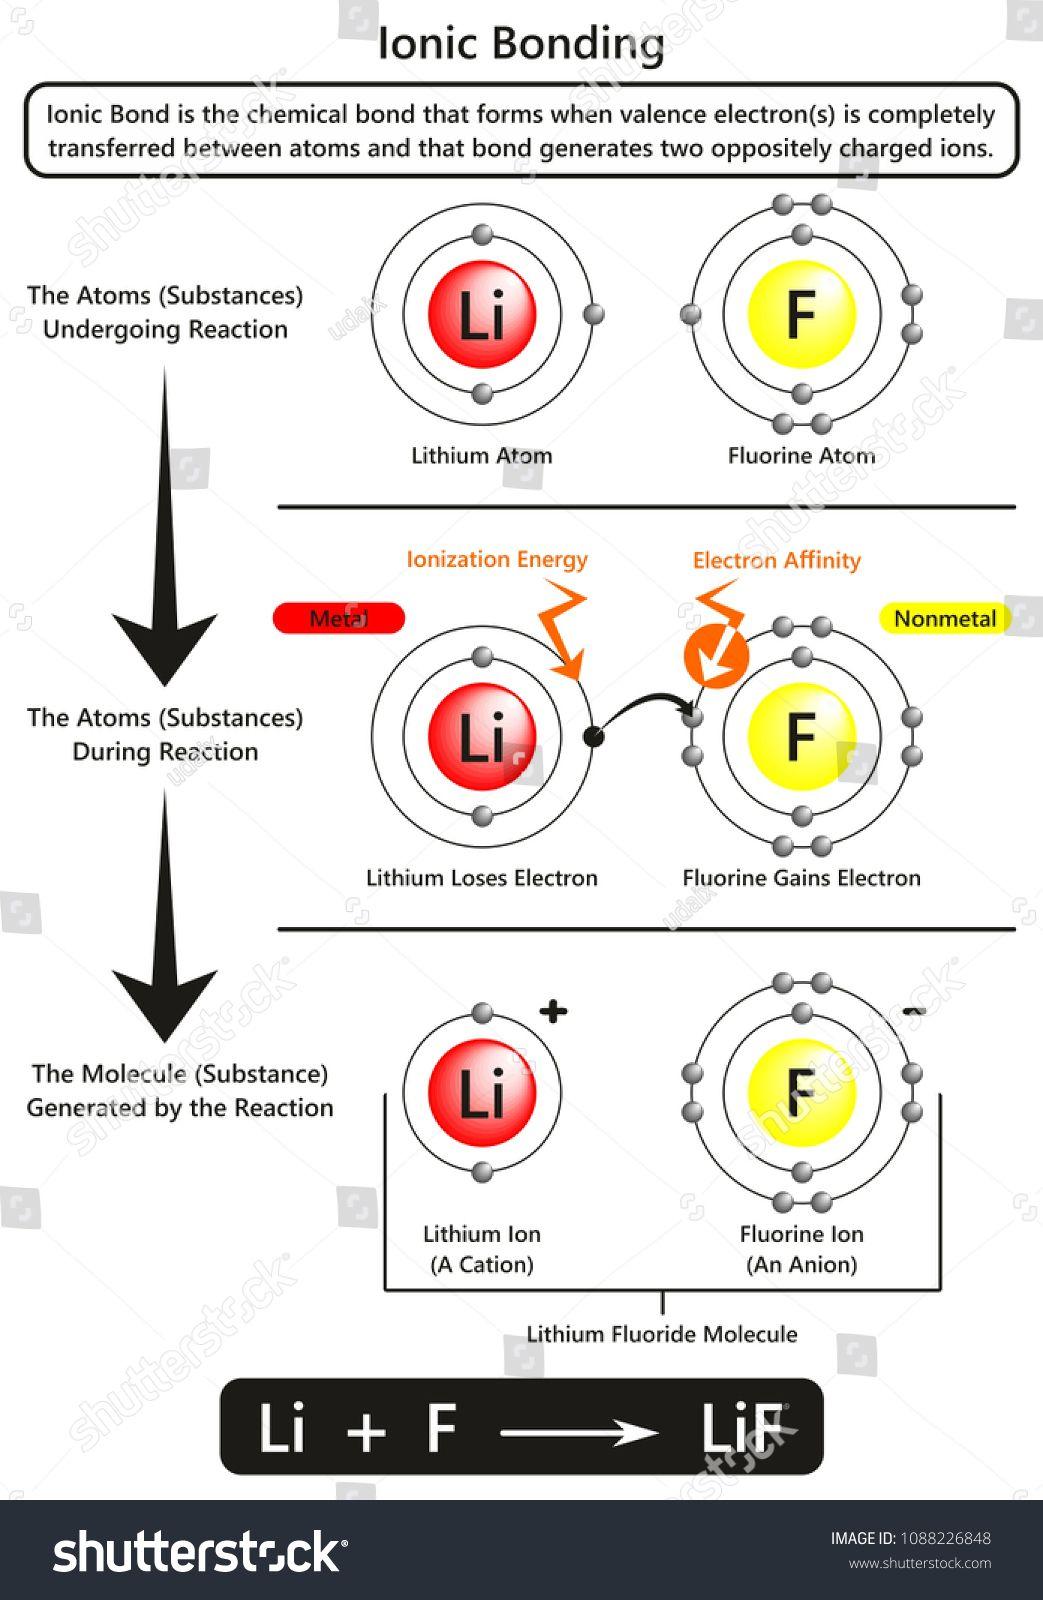 Fluorine Dot Diagram : fluorine, diagram, Ionic, Bonding, Infographic, Diagram, Example, Between, Lithium, Fluorine, Atoms, Showing, Ionizatio…, Bonding,, Electron, Affinity,, Chemical